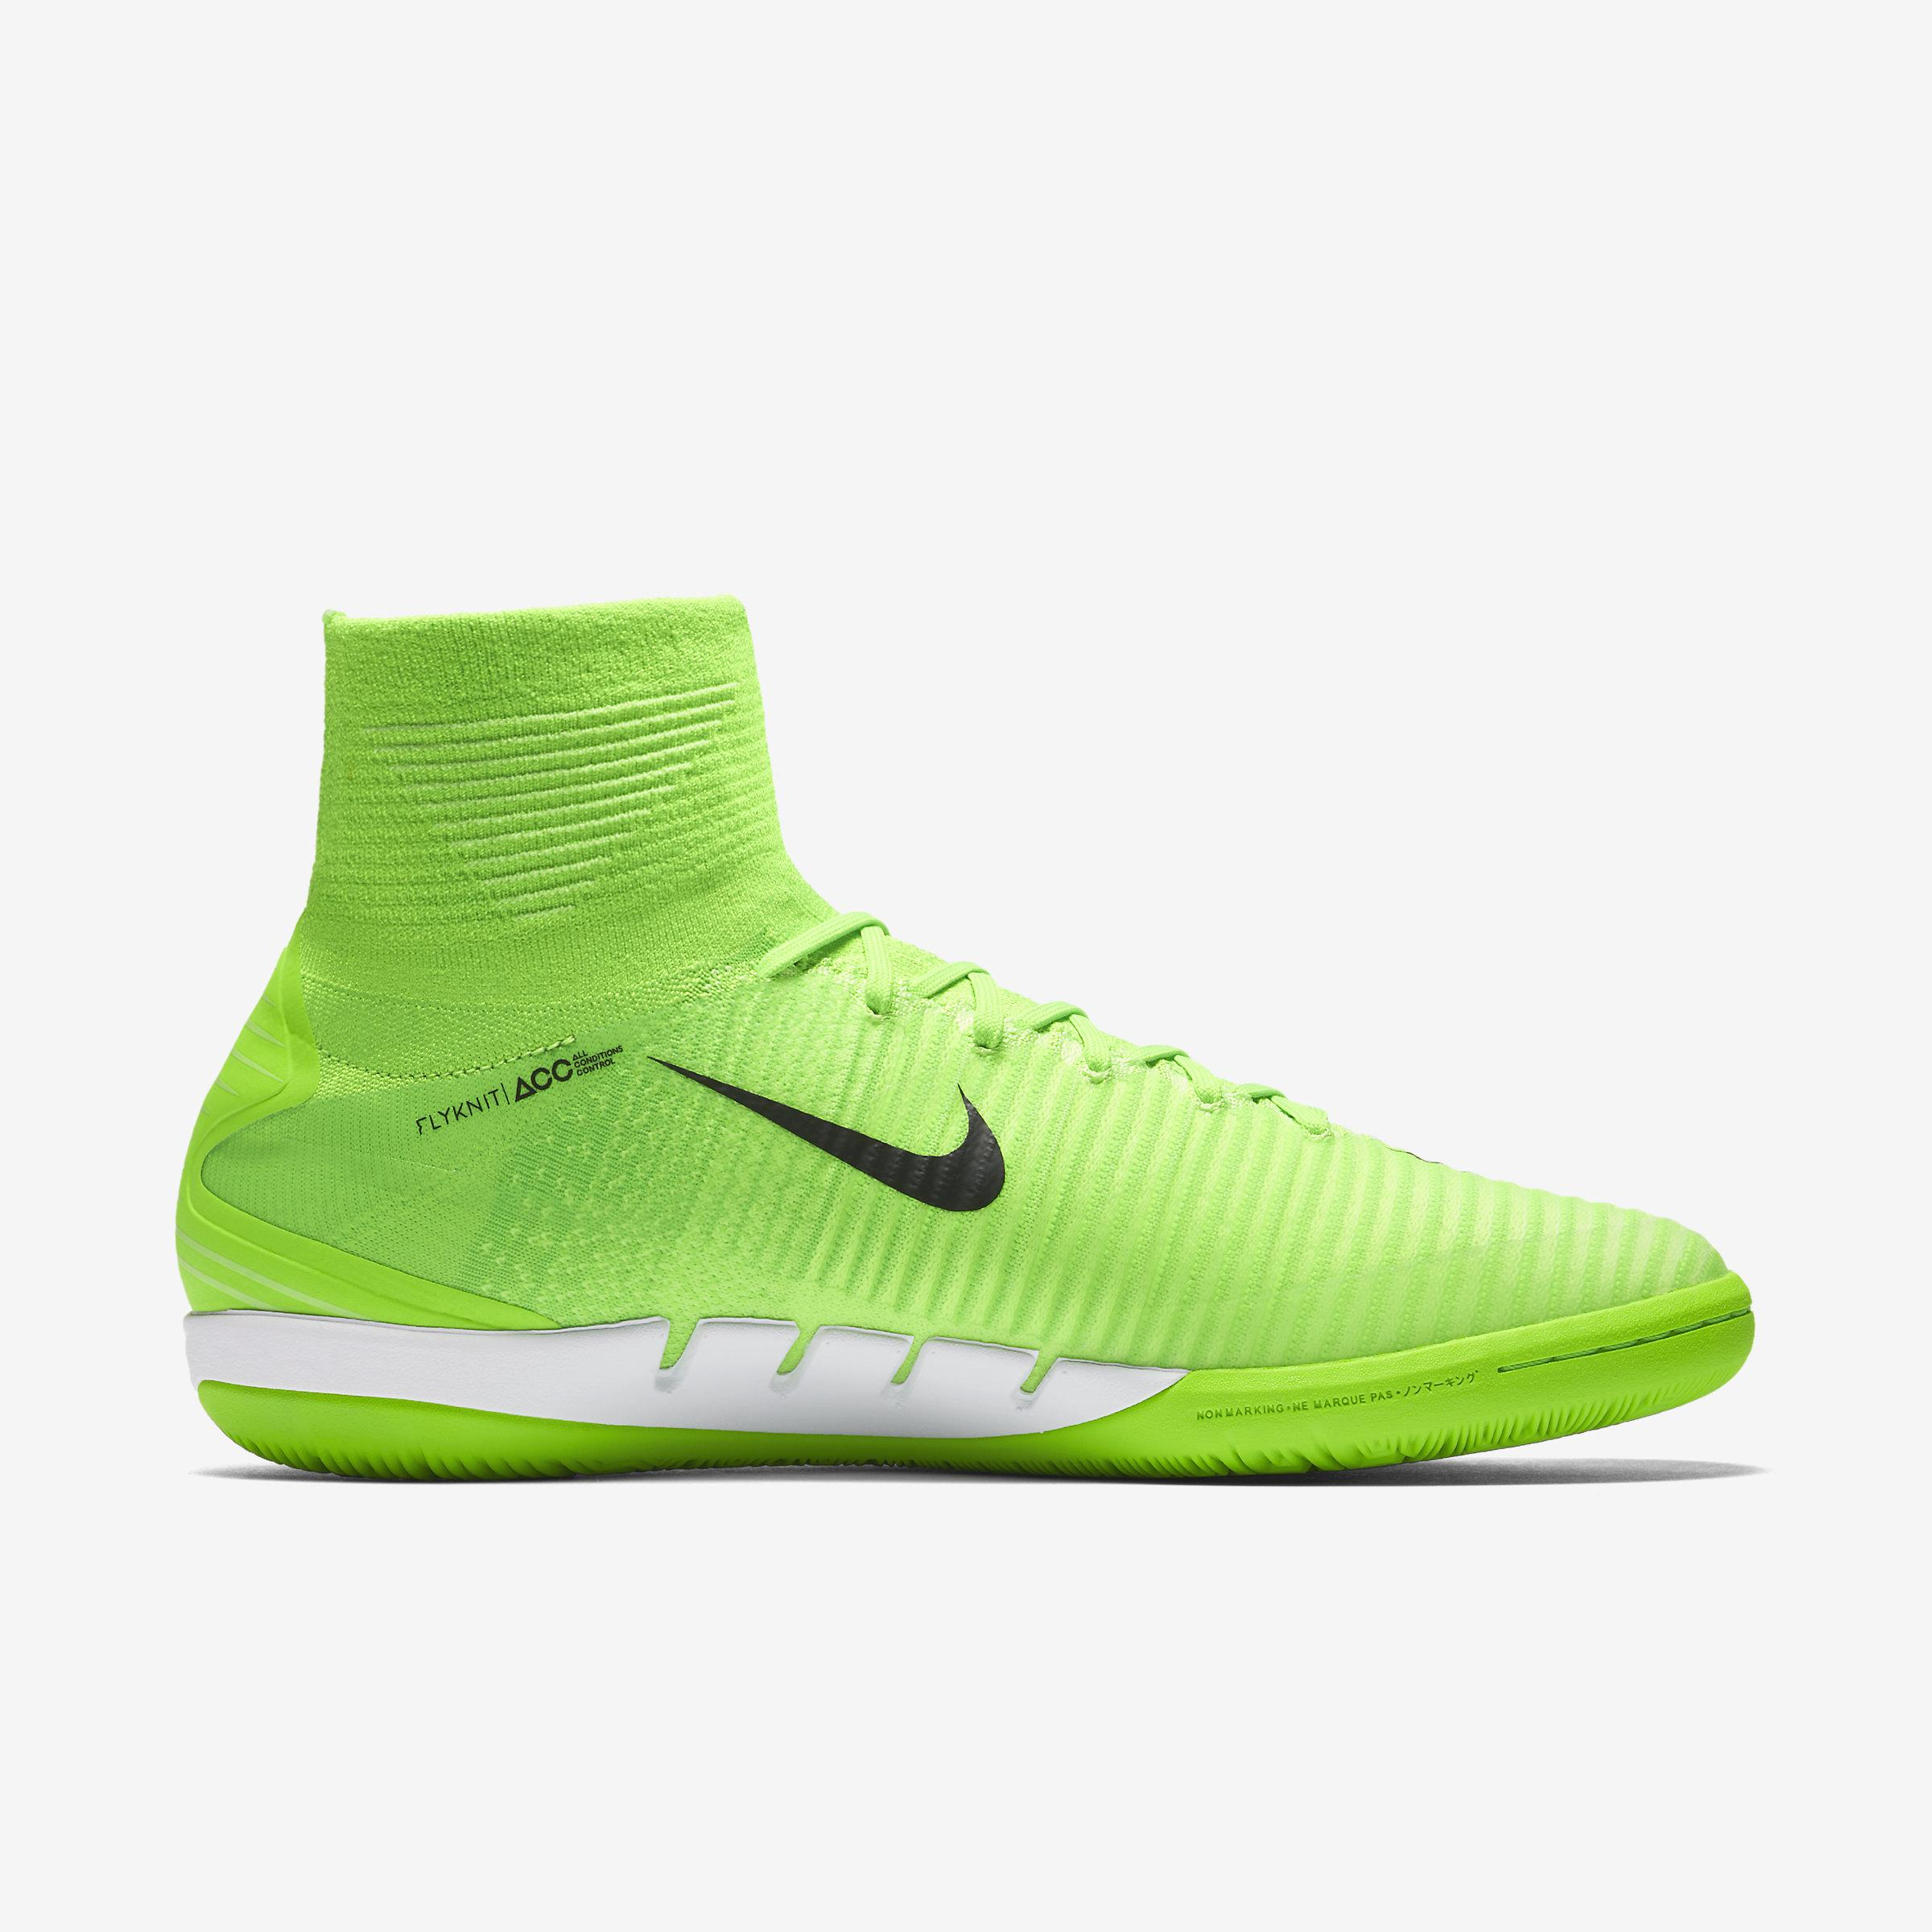 Nike Rubber Mercurialx Proximo Ii Df Ic in Green for Men